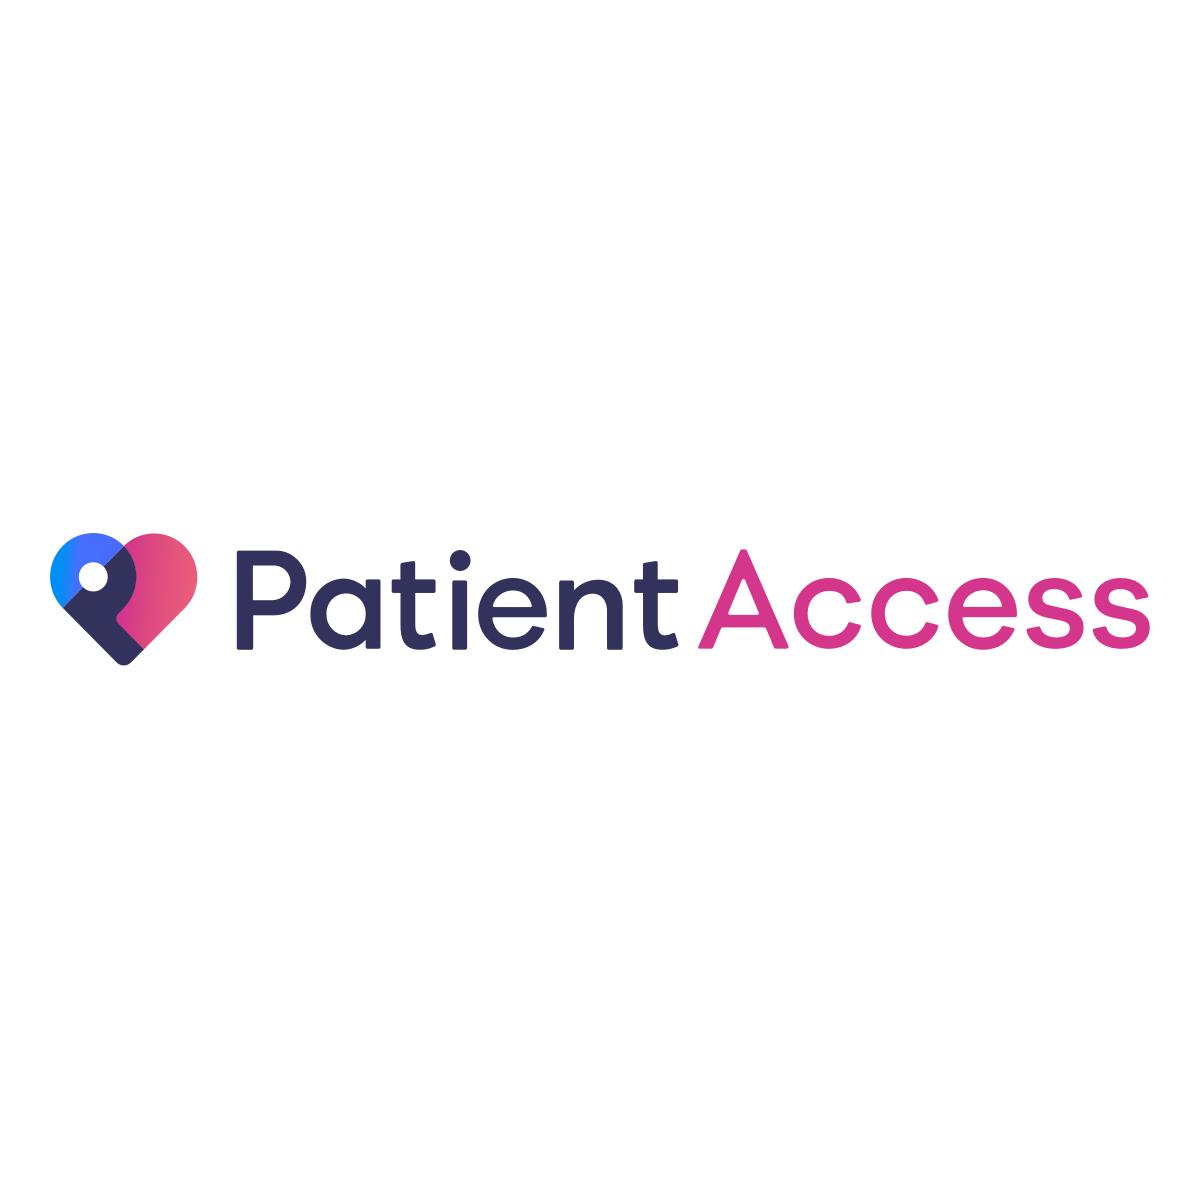 Patient Access Support Portal